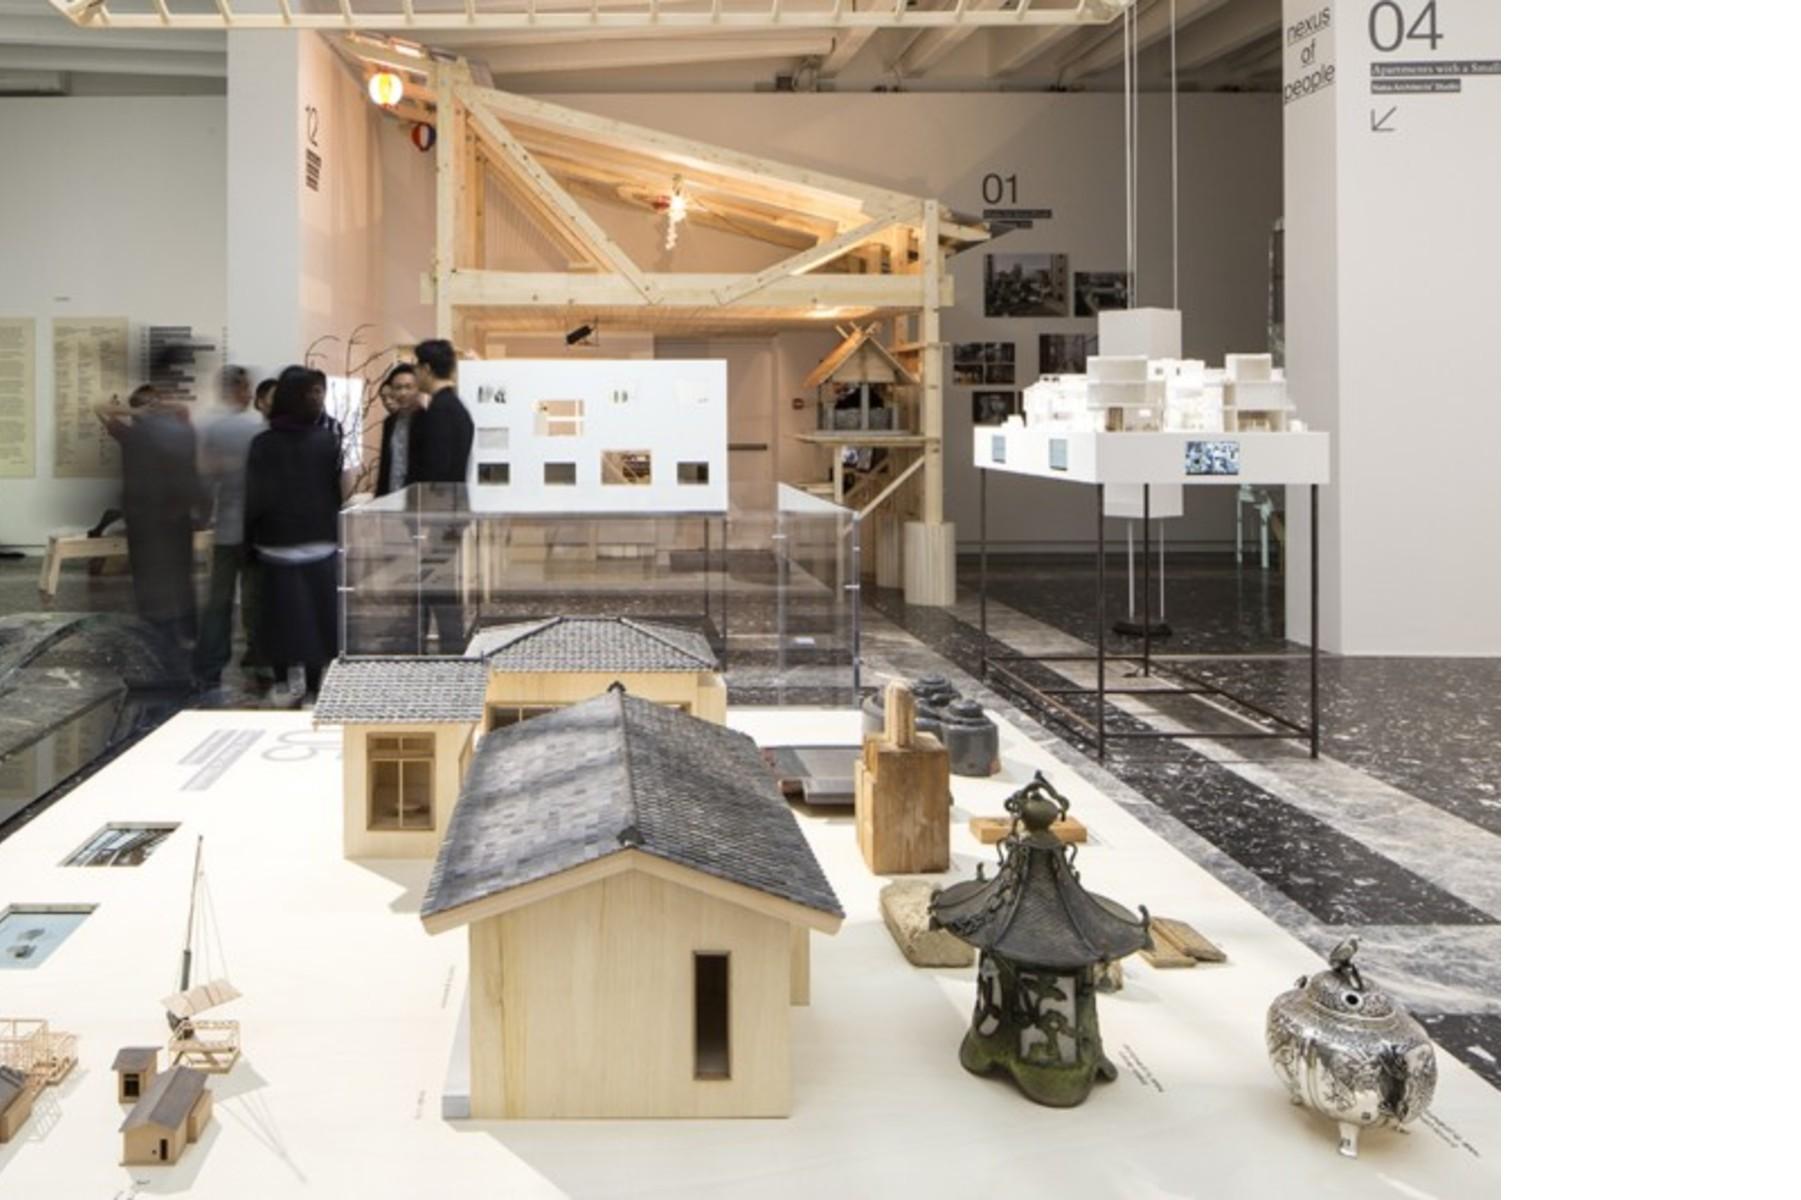 Images courtesy of La Biennale di Venezia, photo by Francesco Galli